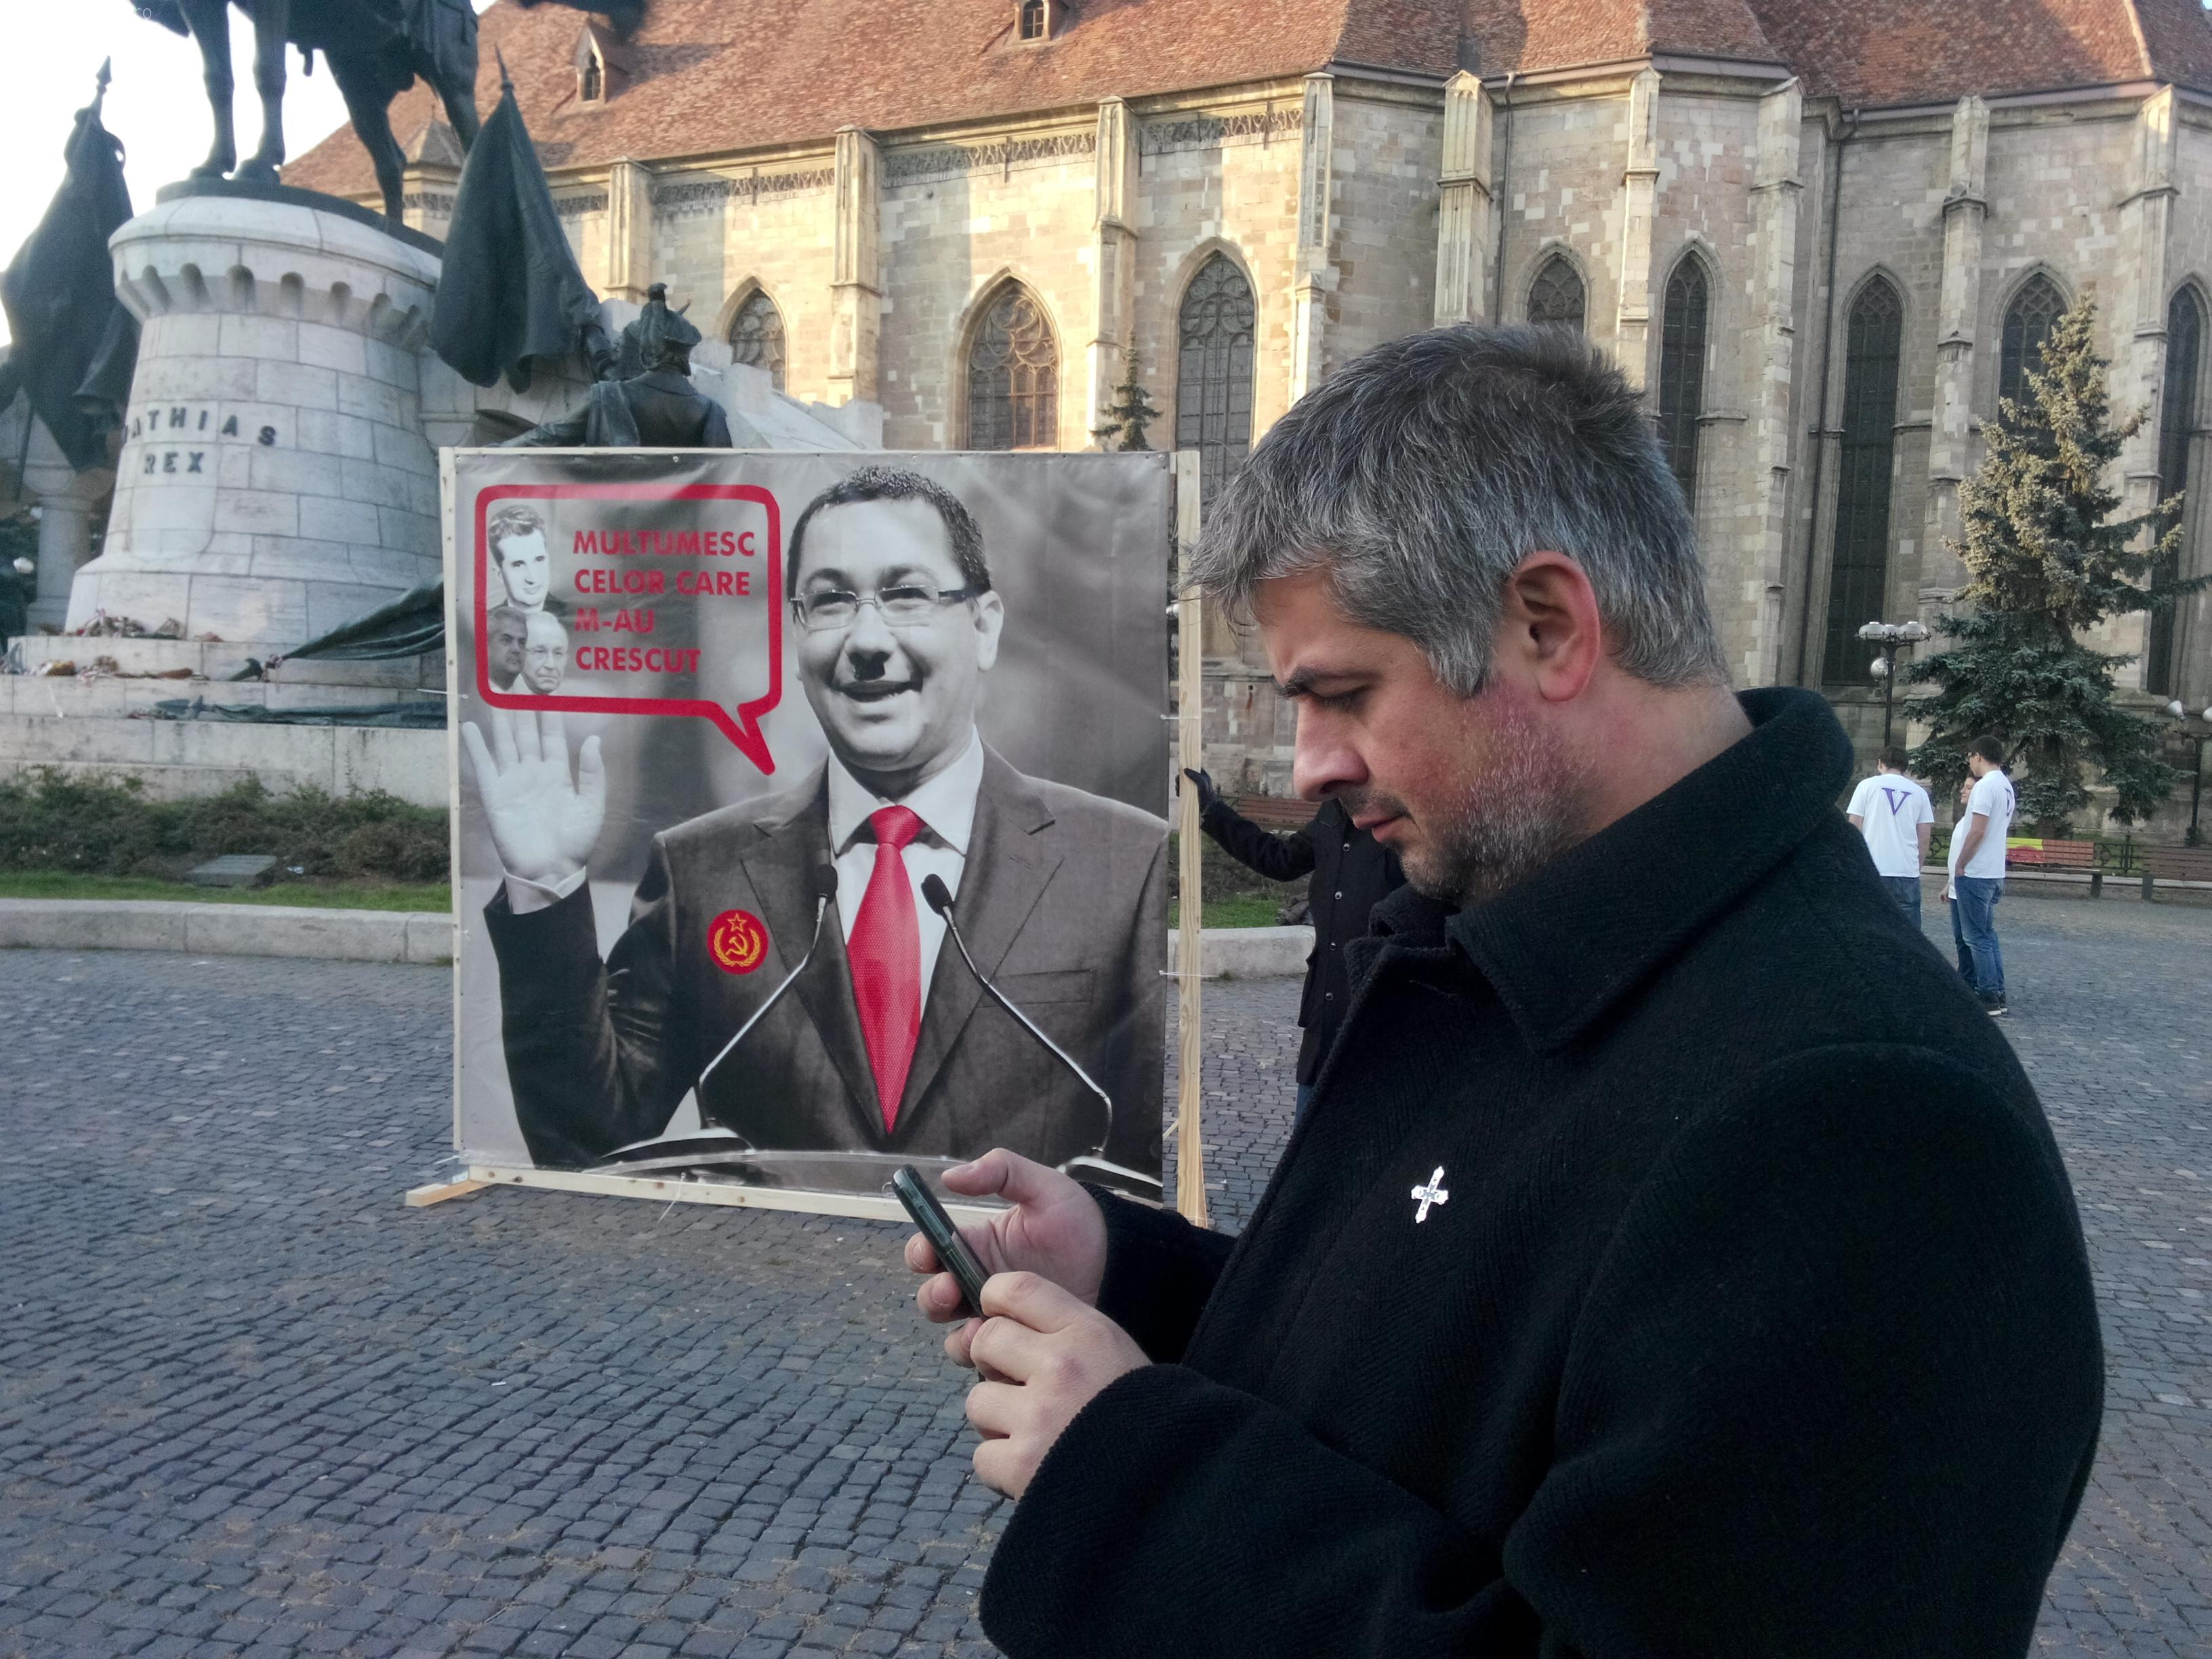 TSD Cluj îi solicită demisia lui Valentin Lungu, directorul Hotel Univers T - FOTO